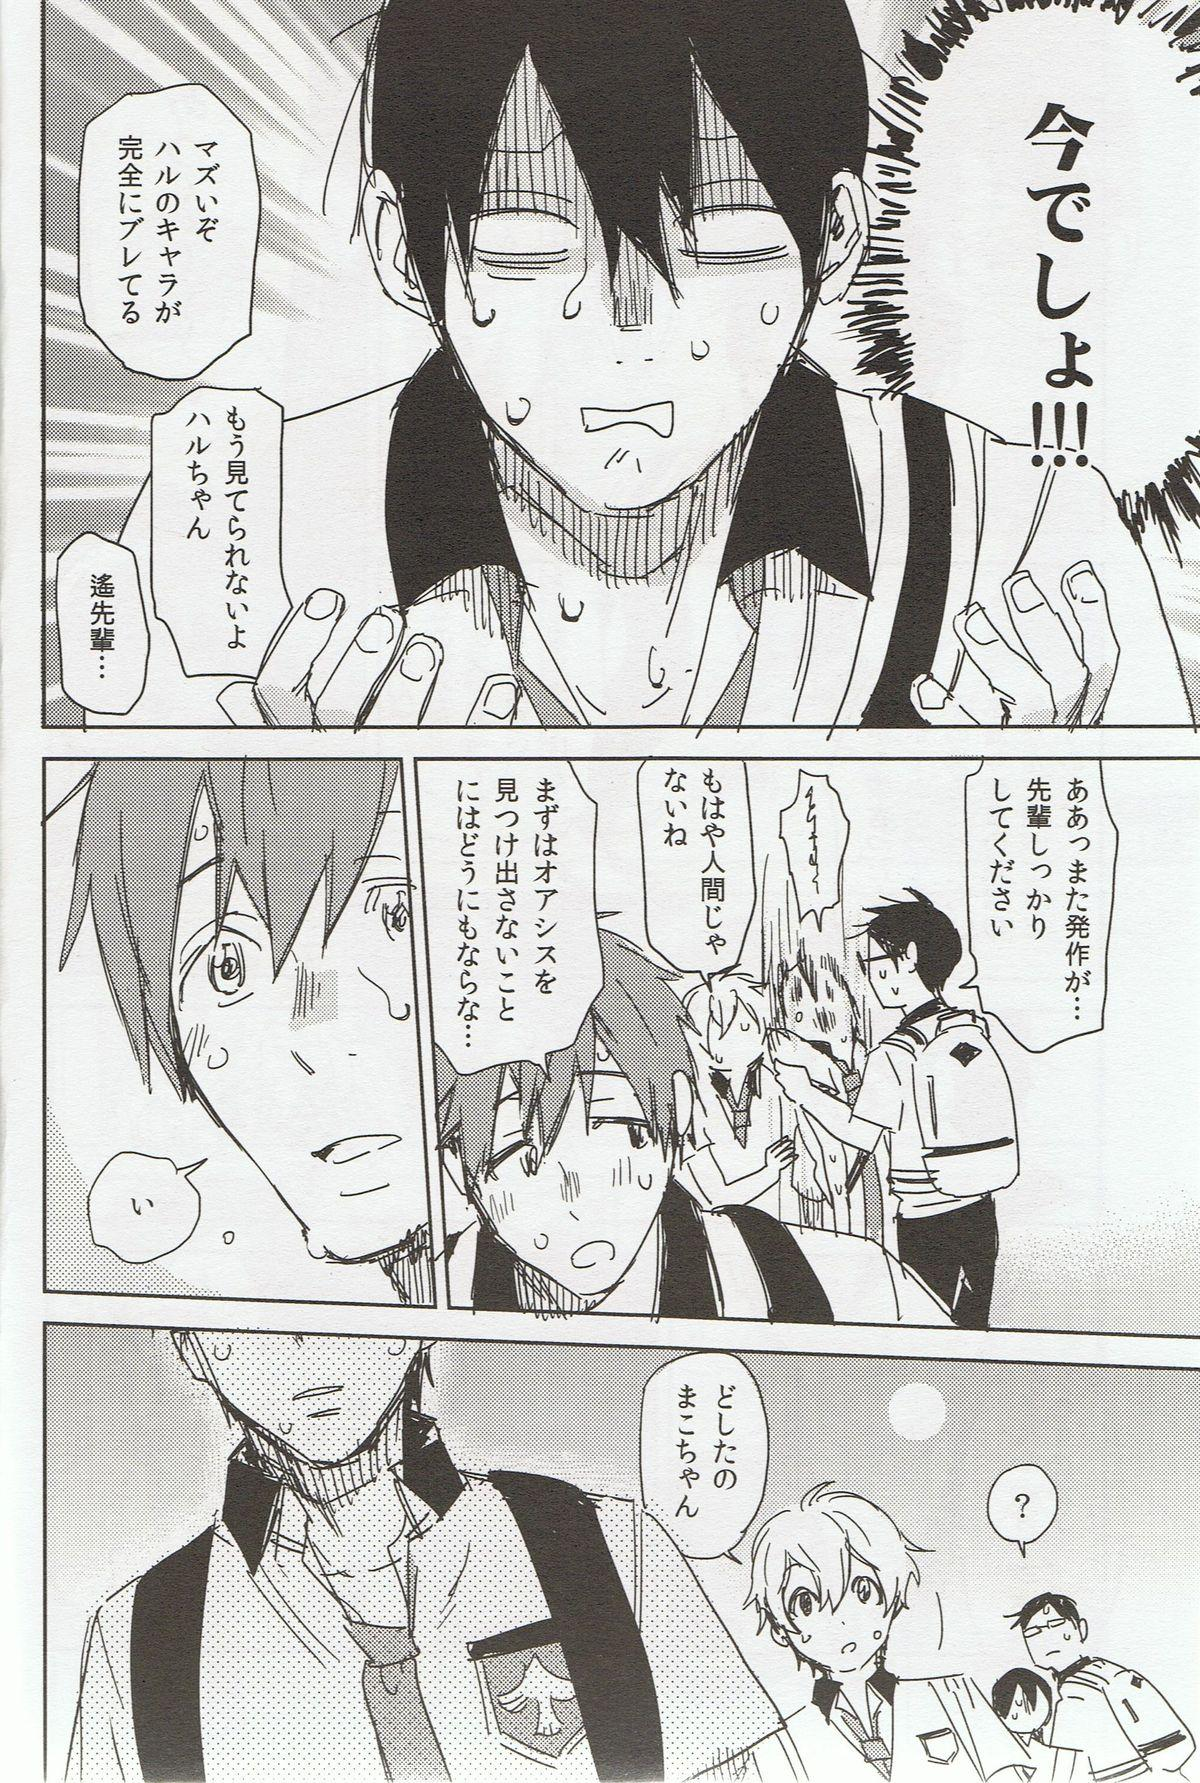 Sou da, Tottori Sakyuu Ikou. 10